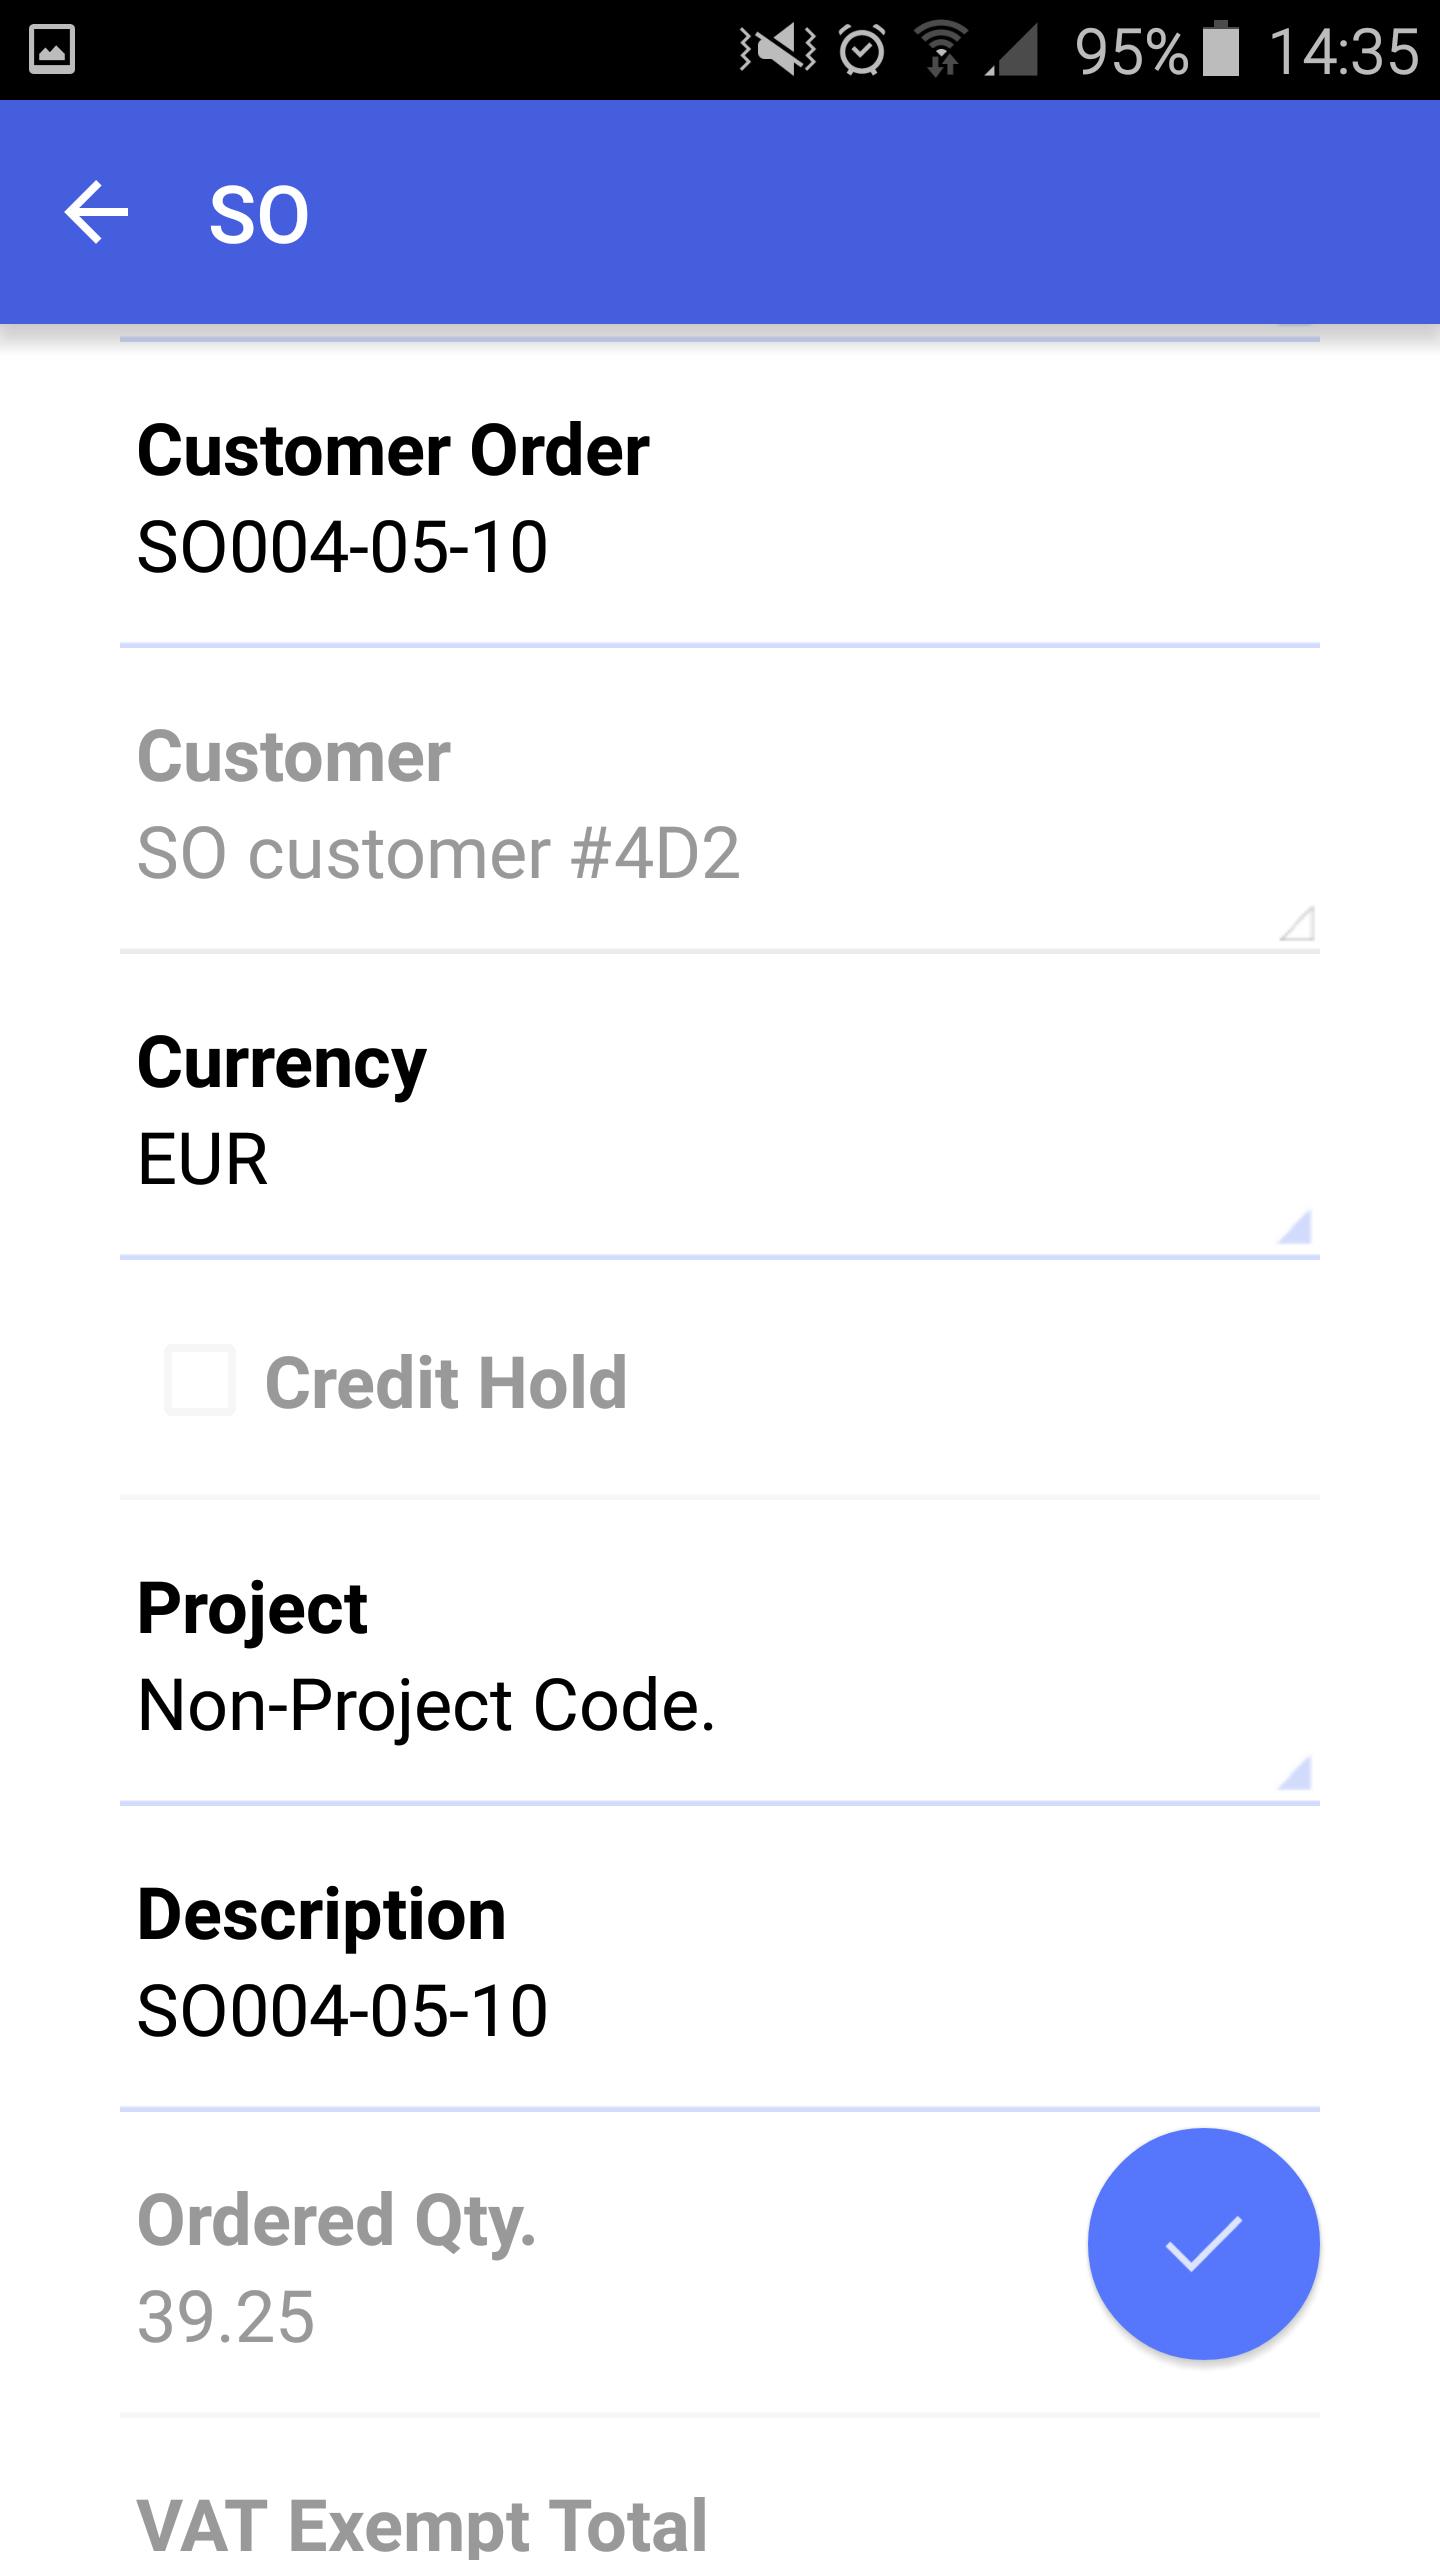 Acumatica ERP Mobile App - Sales Orders